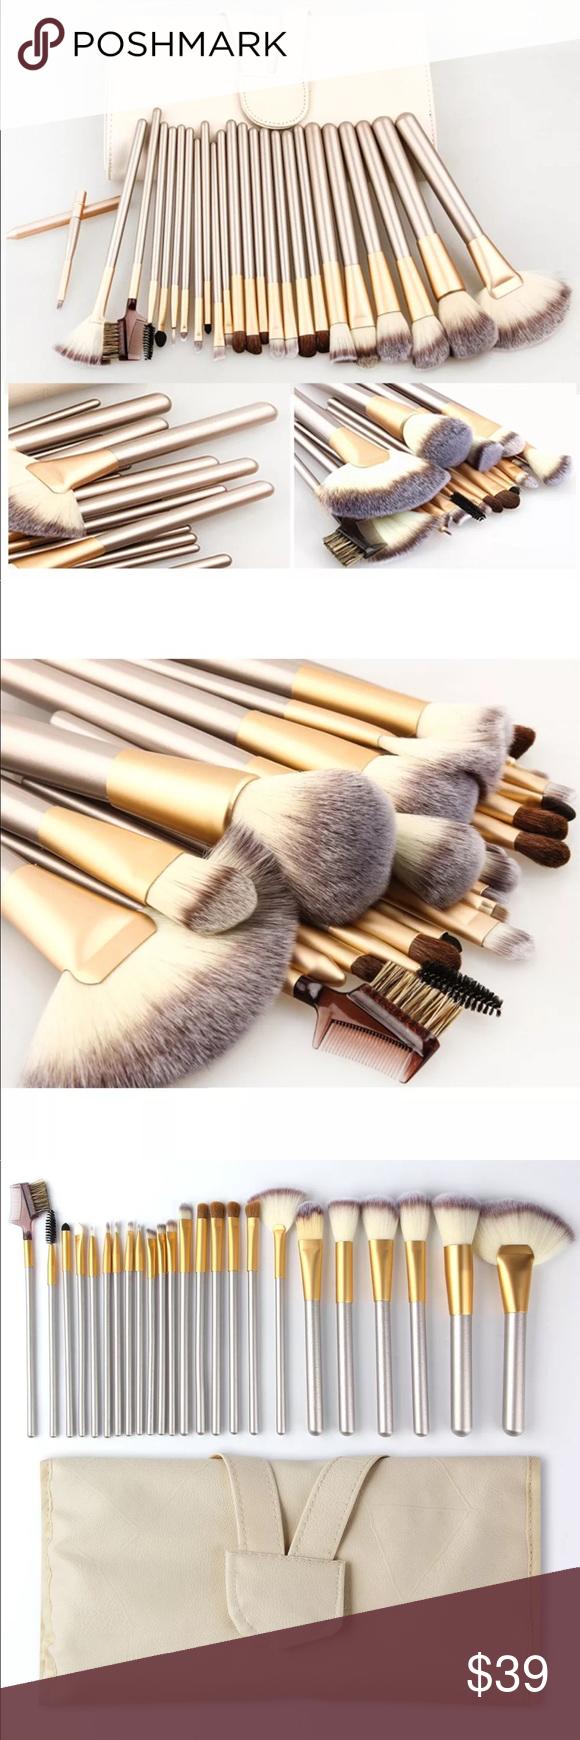 Brand new 32 pcs Vander makeup brush sets tools Boutique